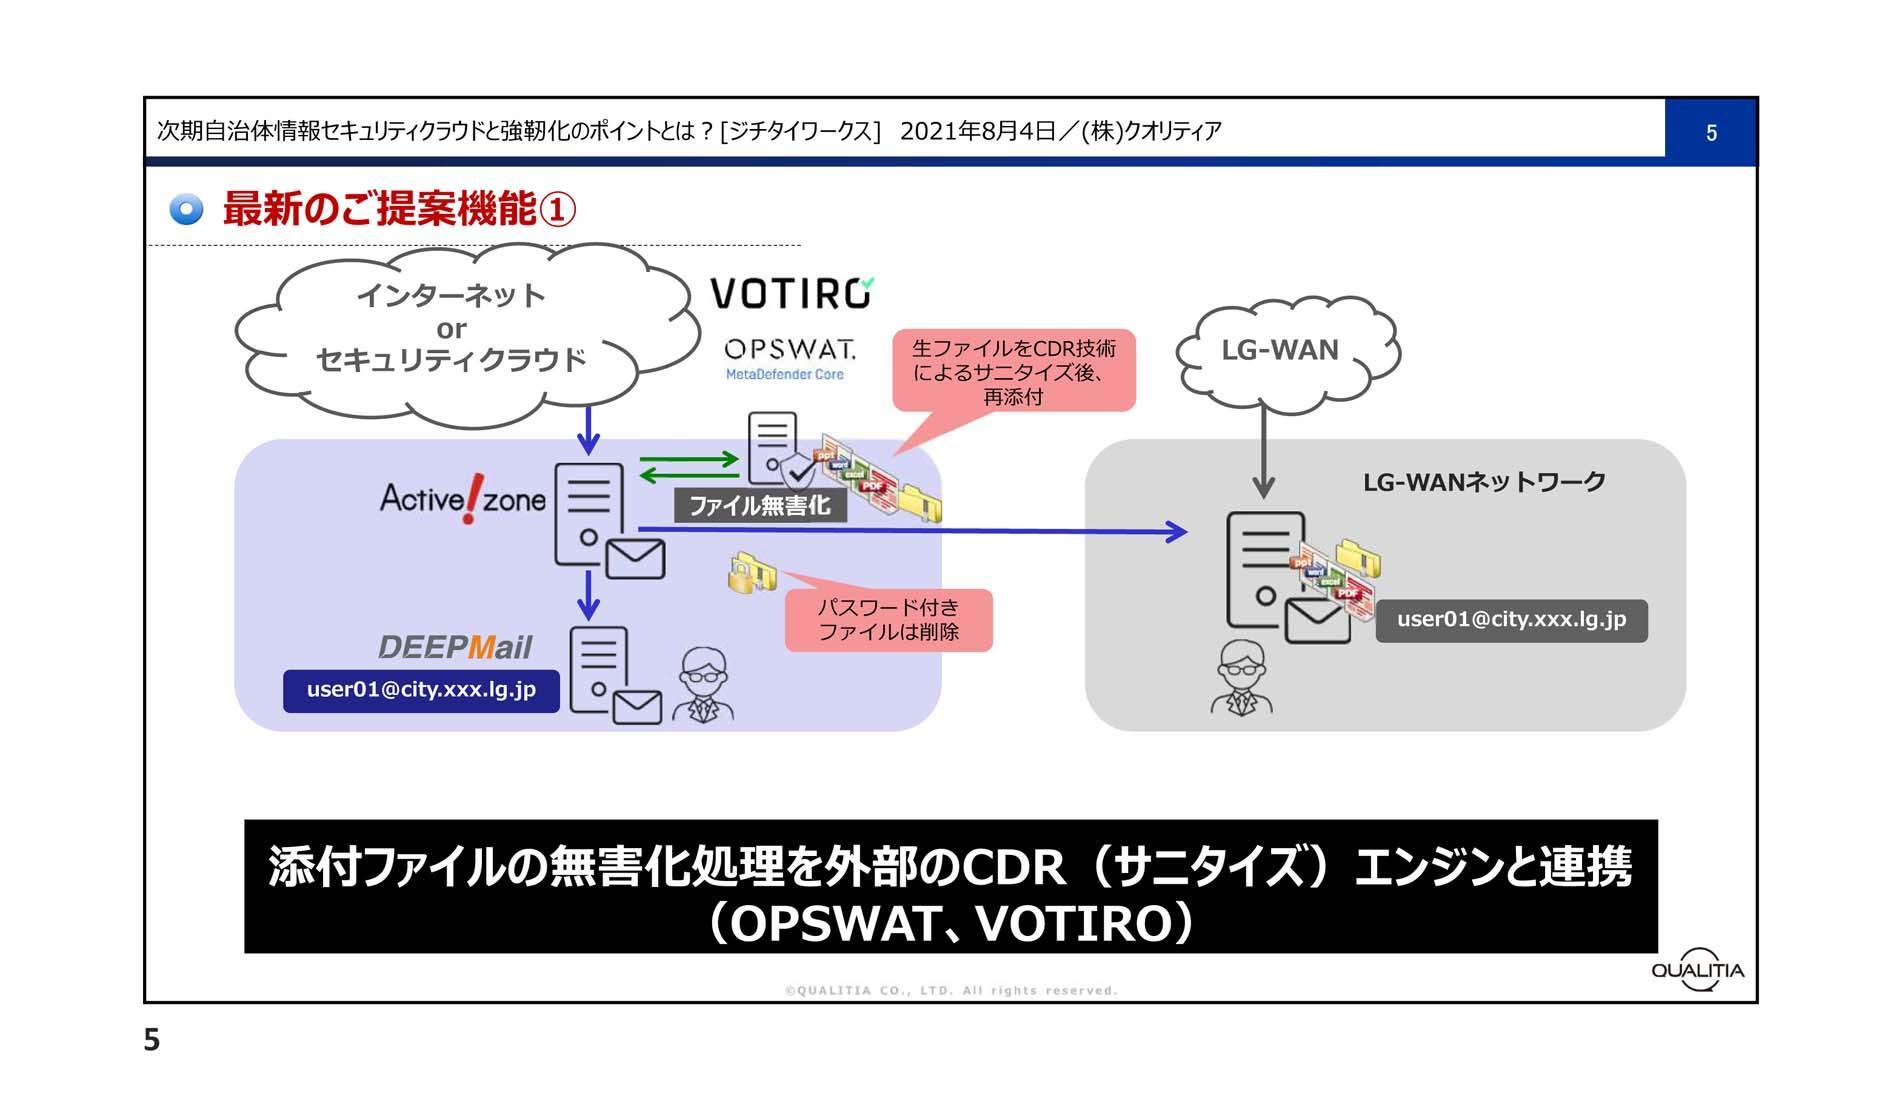 C:\Users\lma-Five\Desktop\オーバル セミレポ\採用画像jpg\2-03.jpg